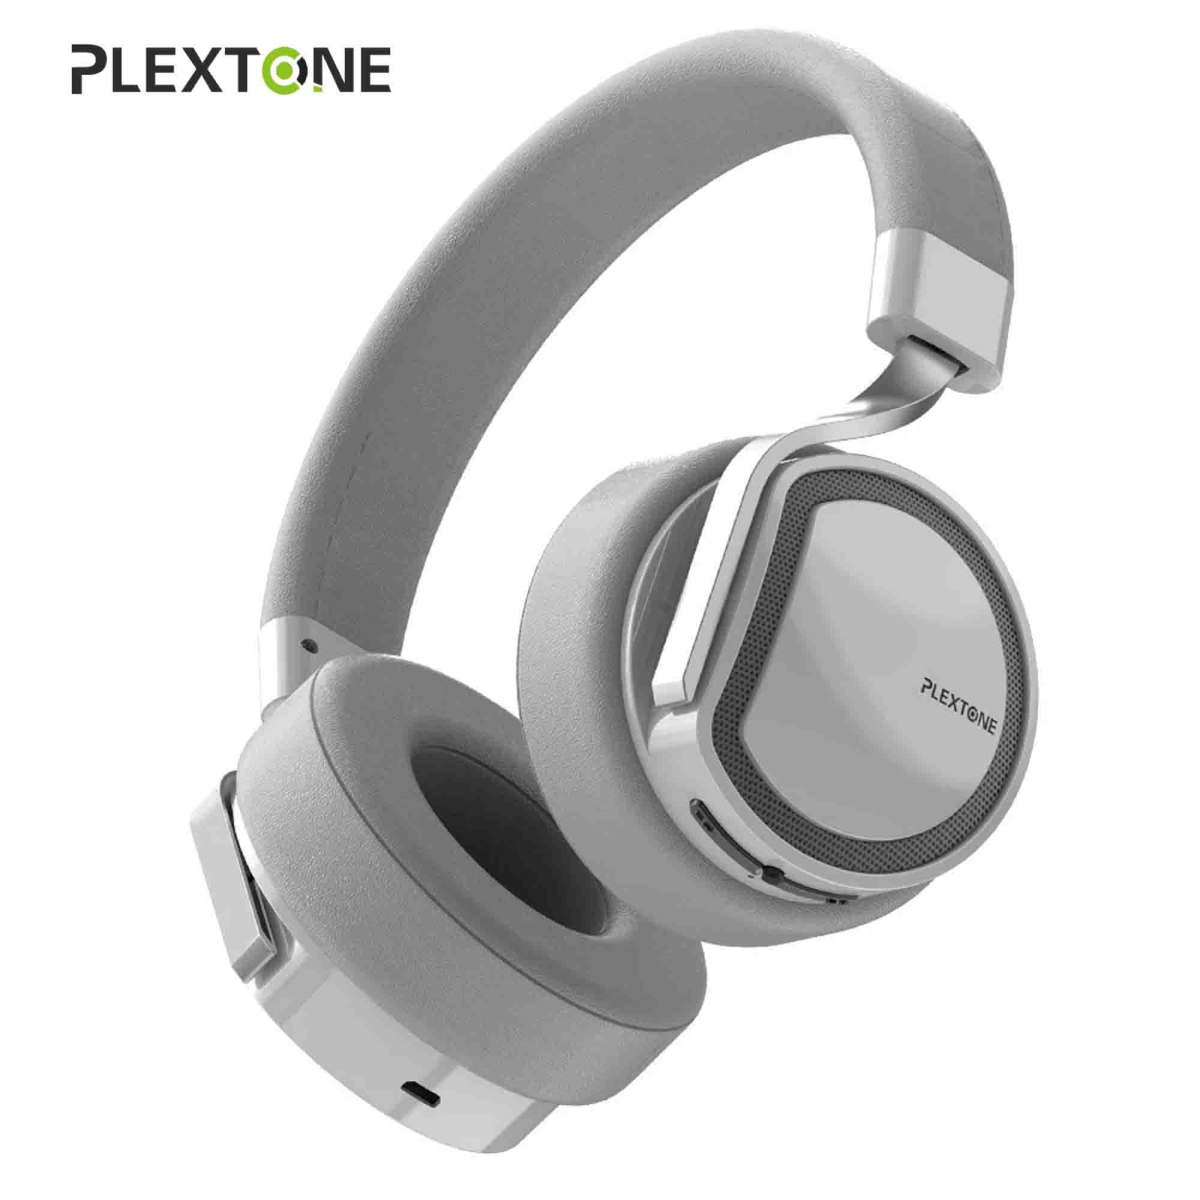 PLEXTONE BT270 Bluetooth Headset-White